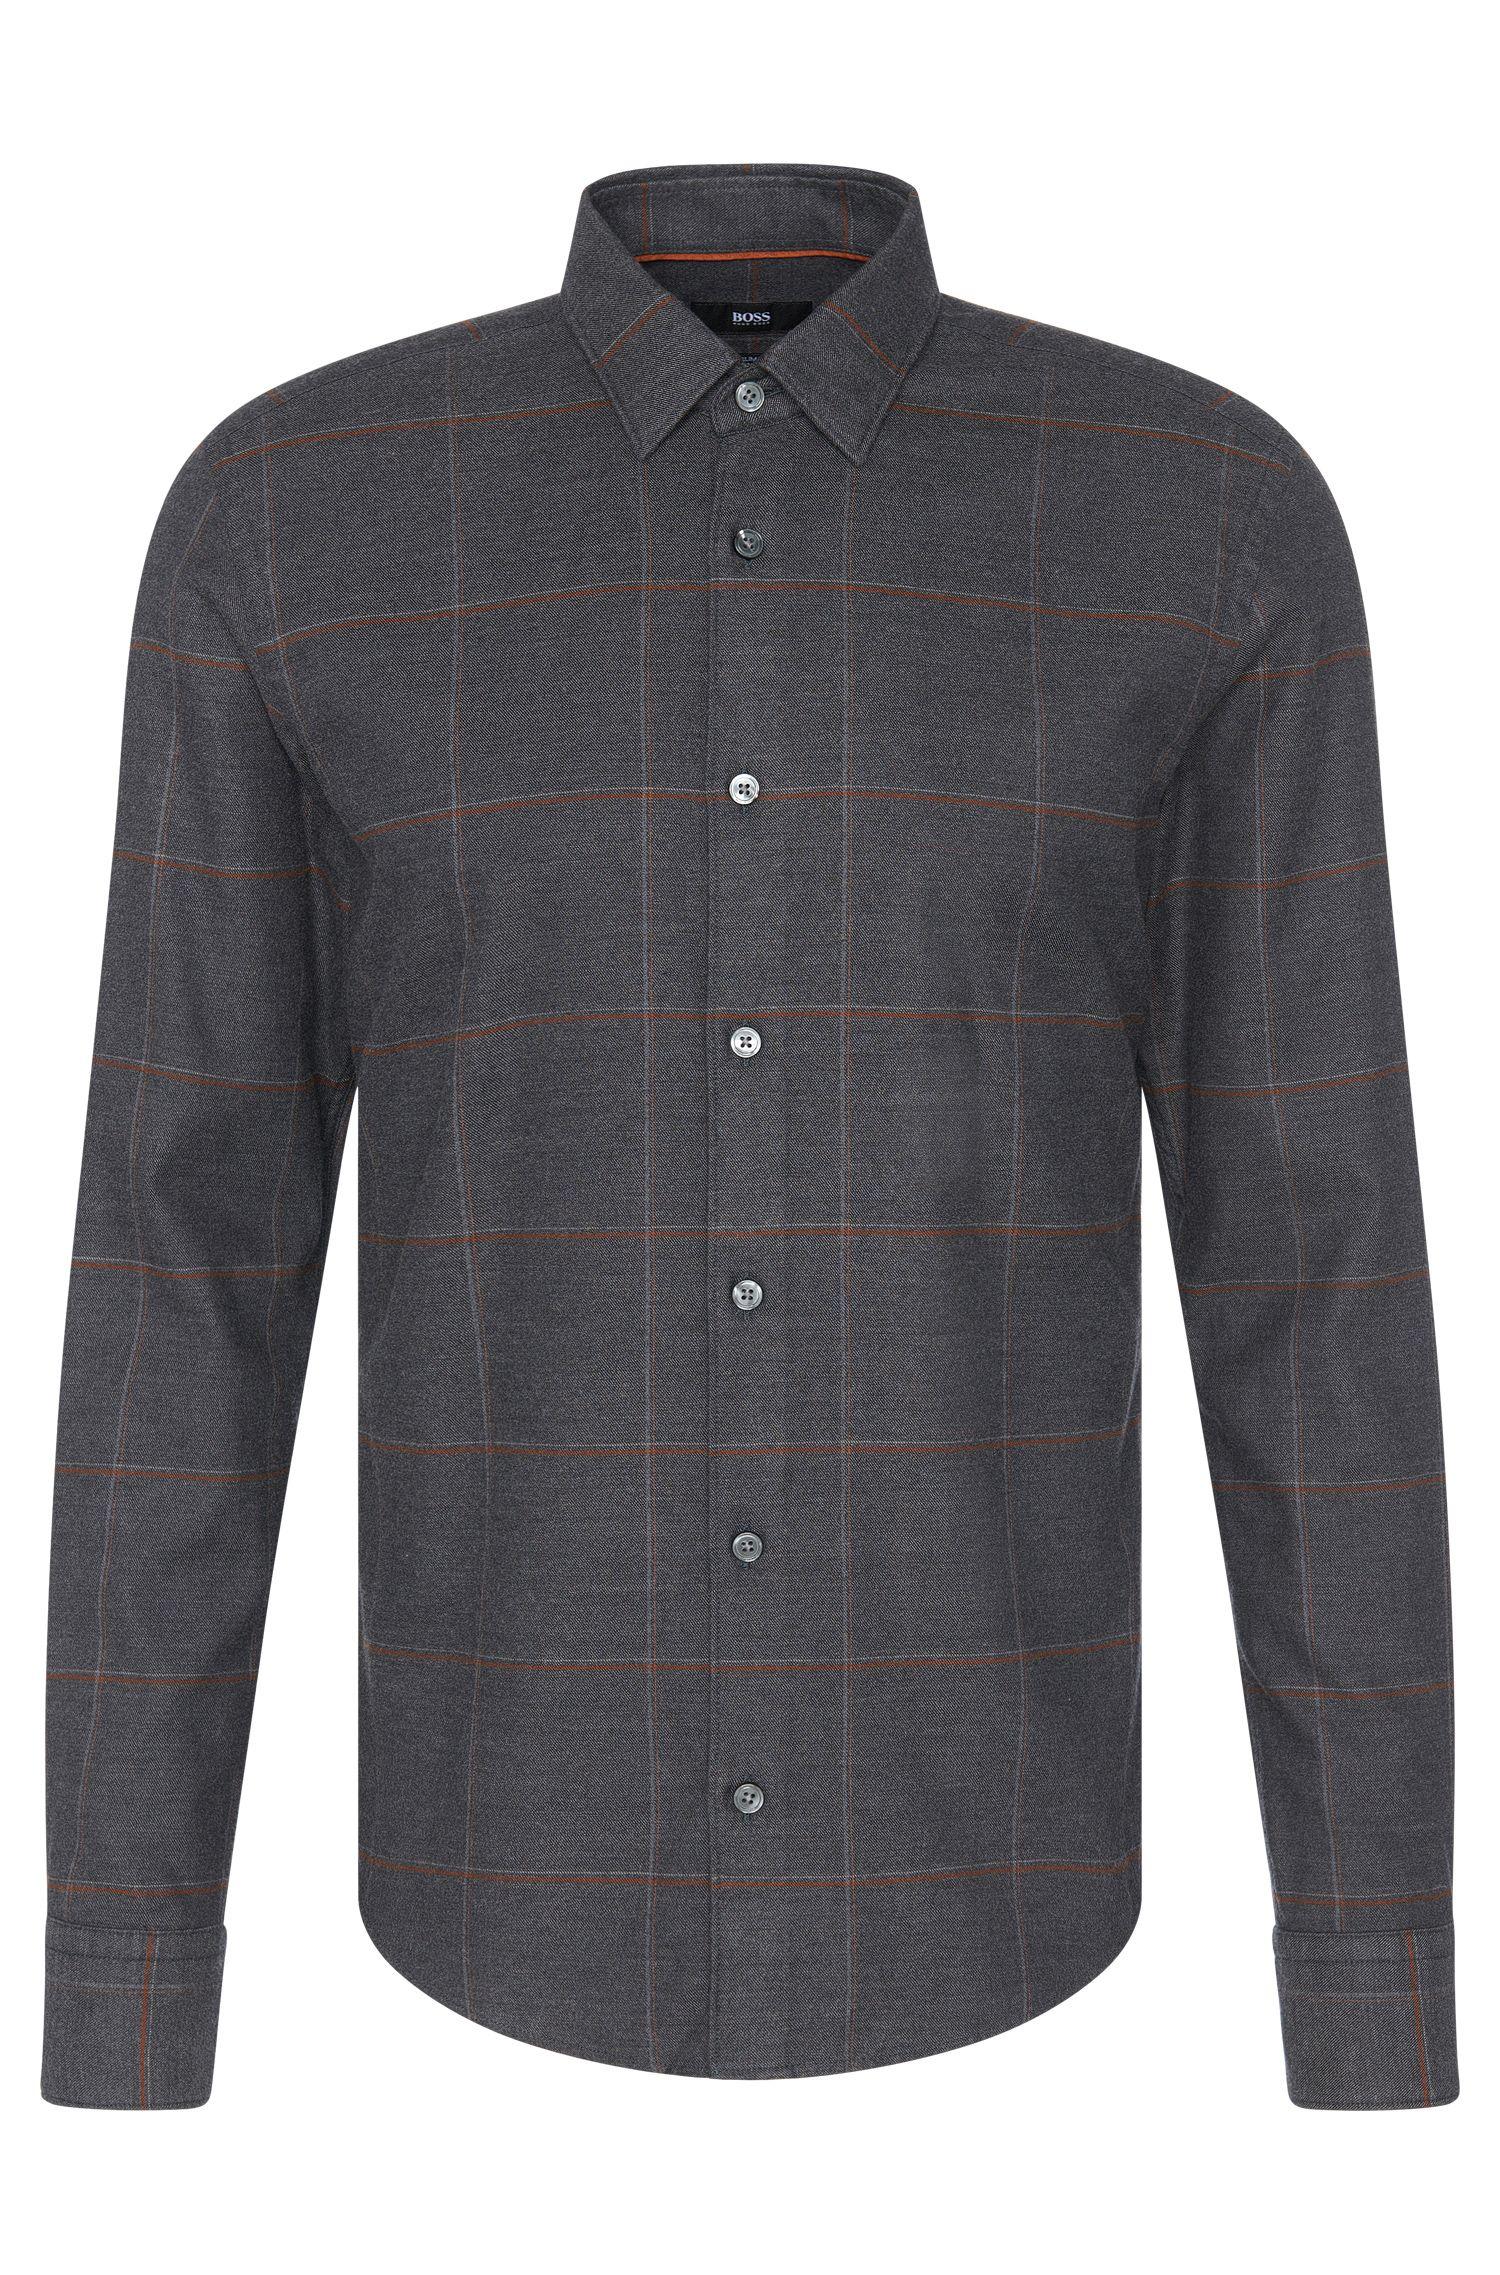 'Reid F' | Slim Fit, Stretch Cotton Button Down Shirt